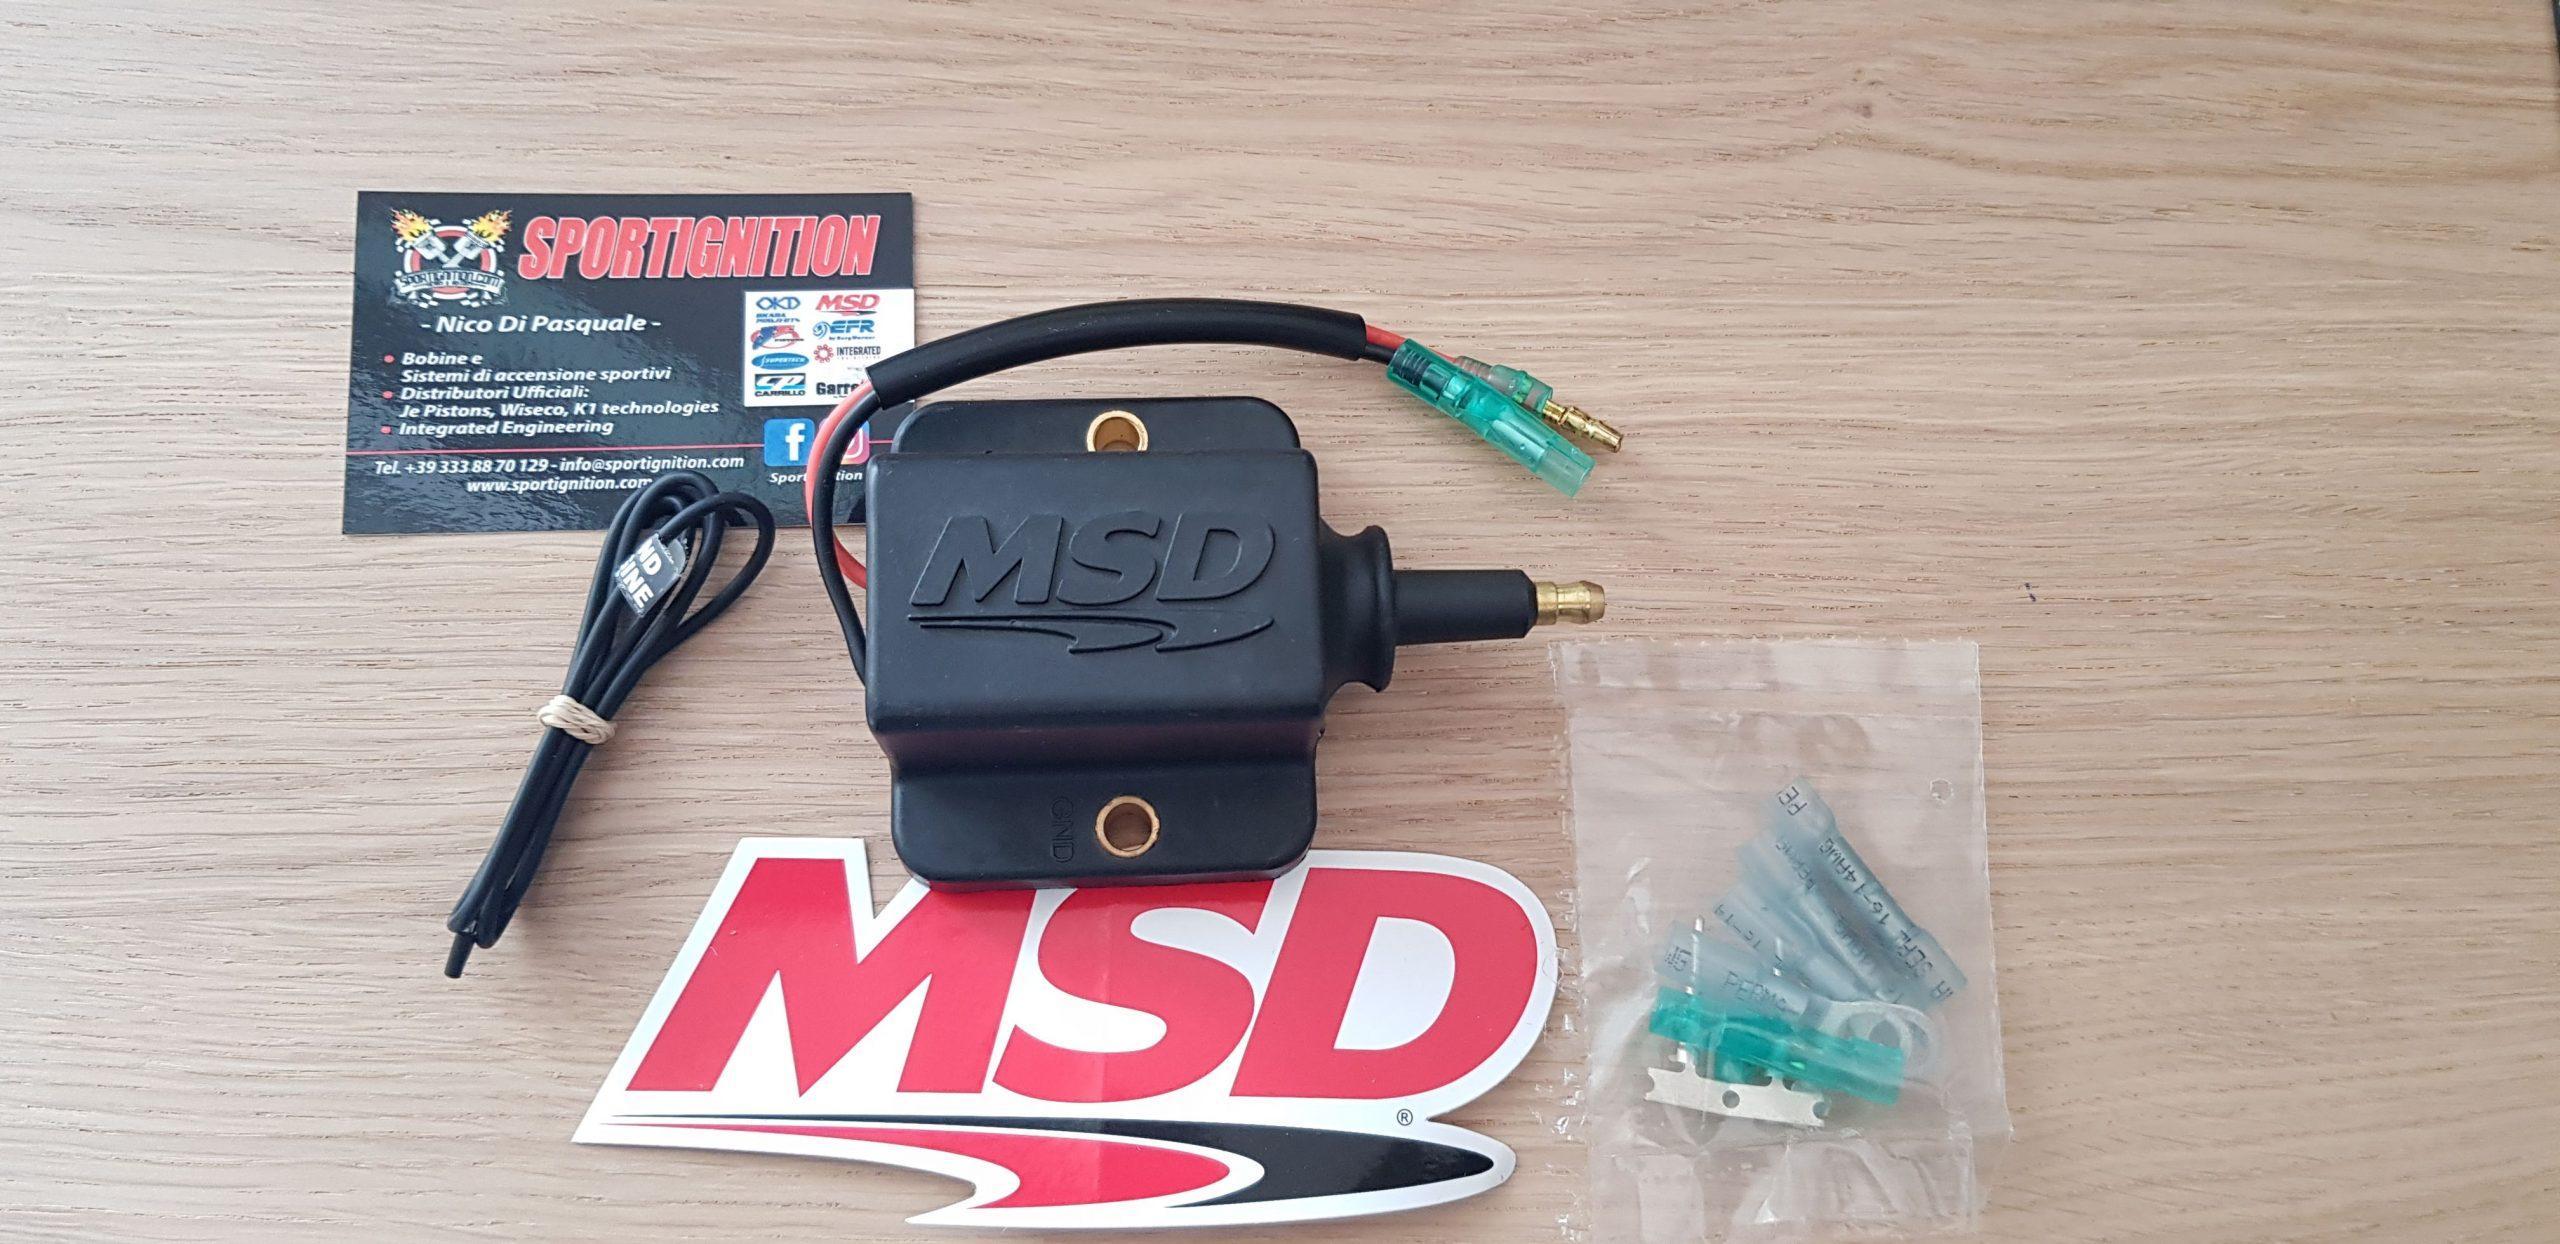 Msd 42921